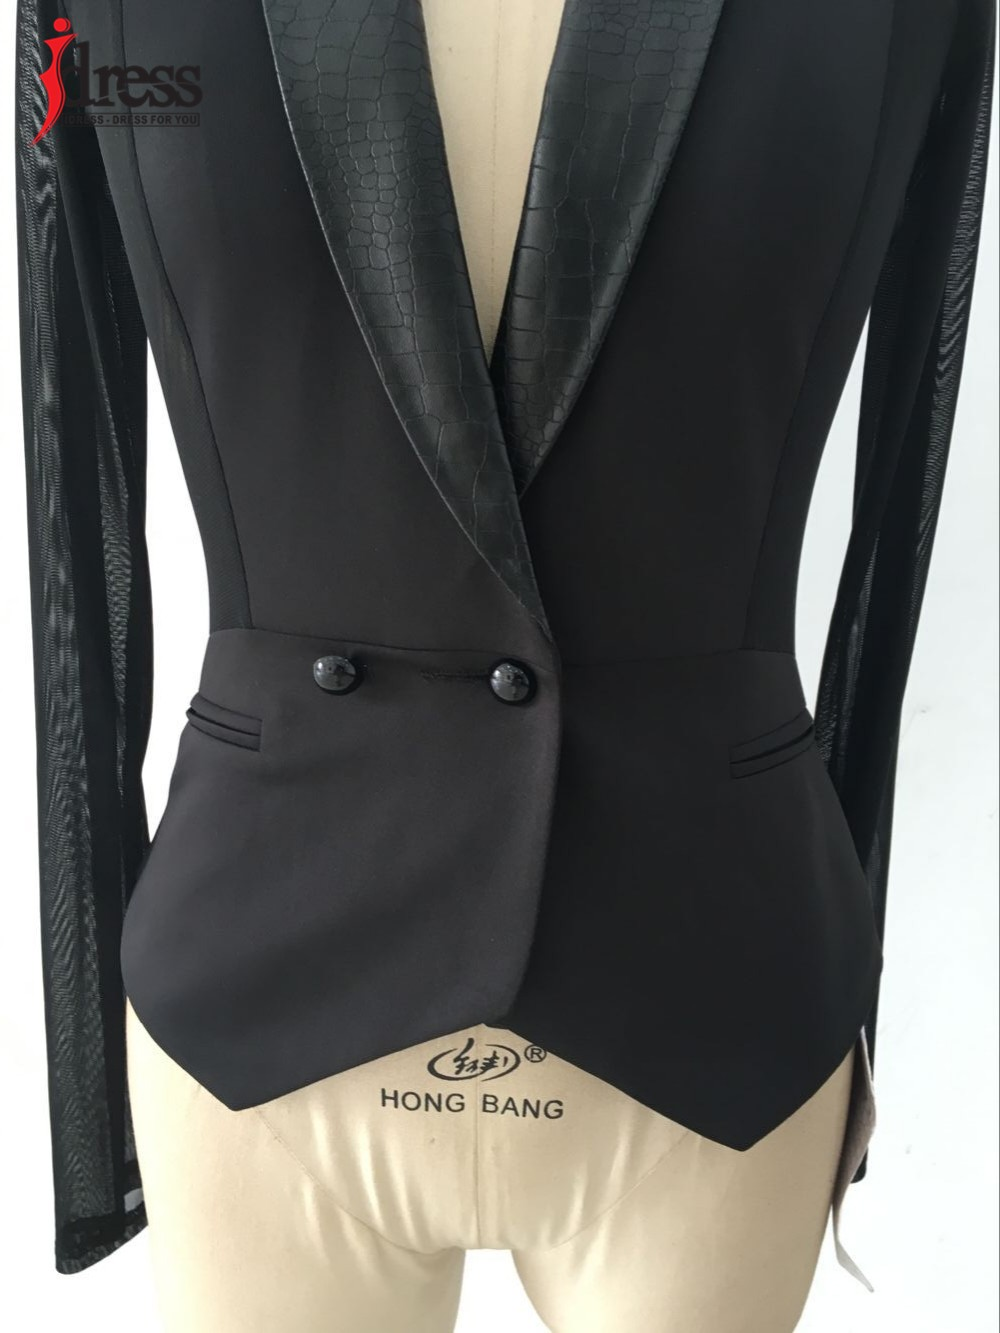 IDress Women Blazer Jackets 2016 Fashion Mulher Sexy Blazer Women Button Veste Femme Blazer Mesh Leather Partchwork Long-Sleeve Slim Blazer Women Blazers (5)